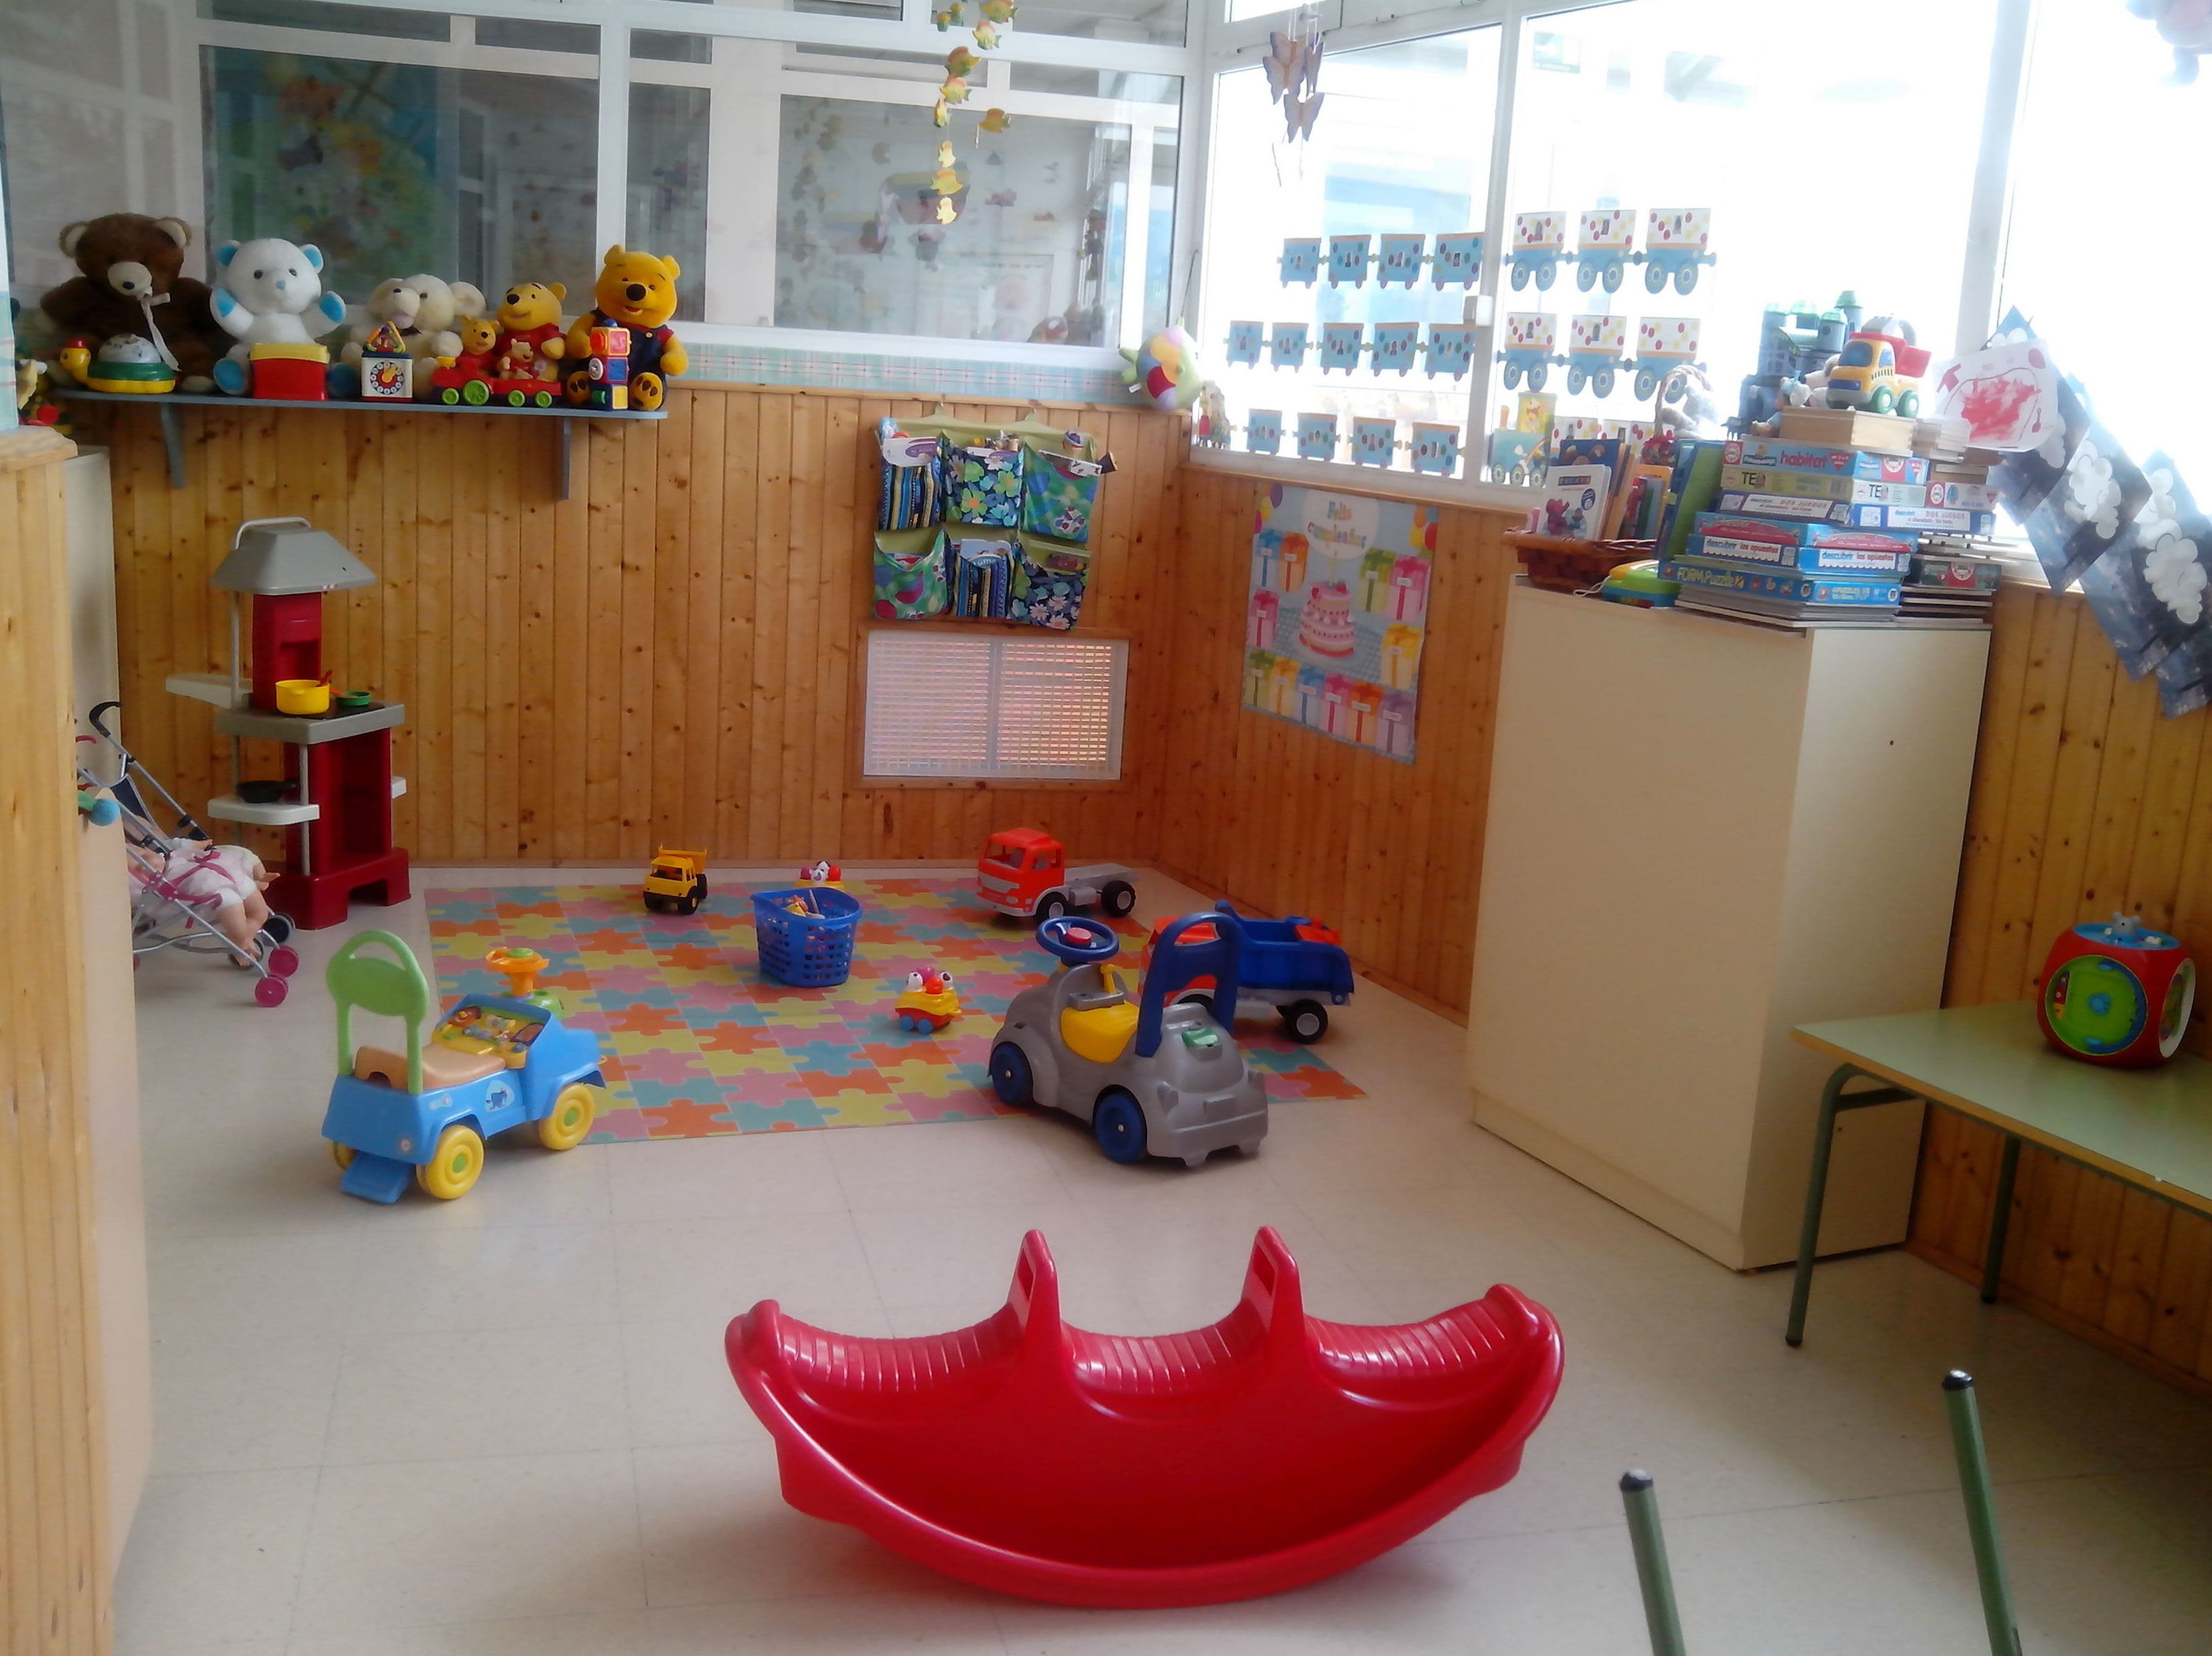 Clases de inglés: Servicios de Escuela Infantil Ñacos